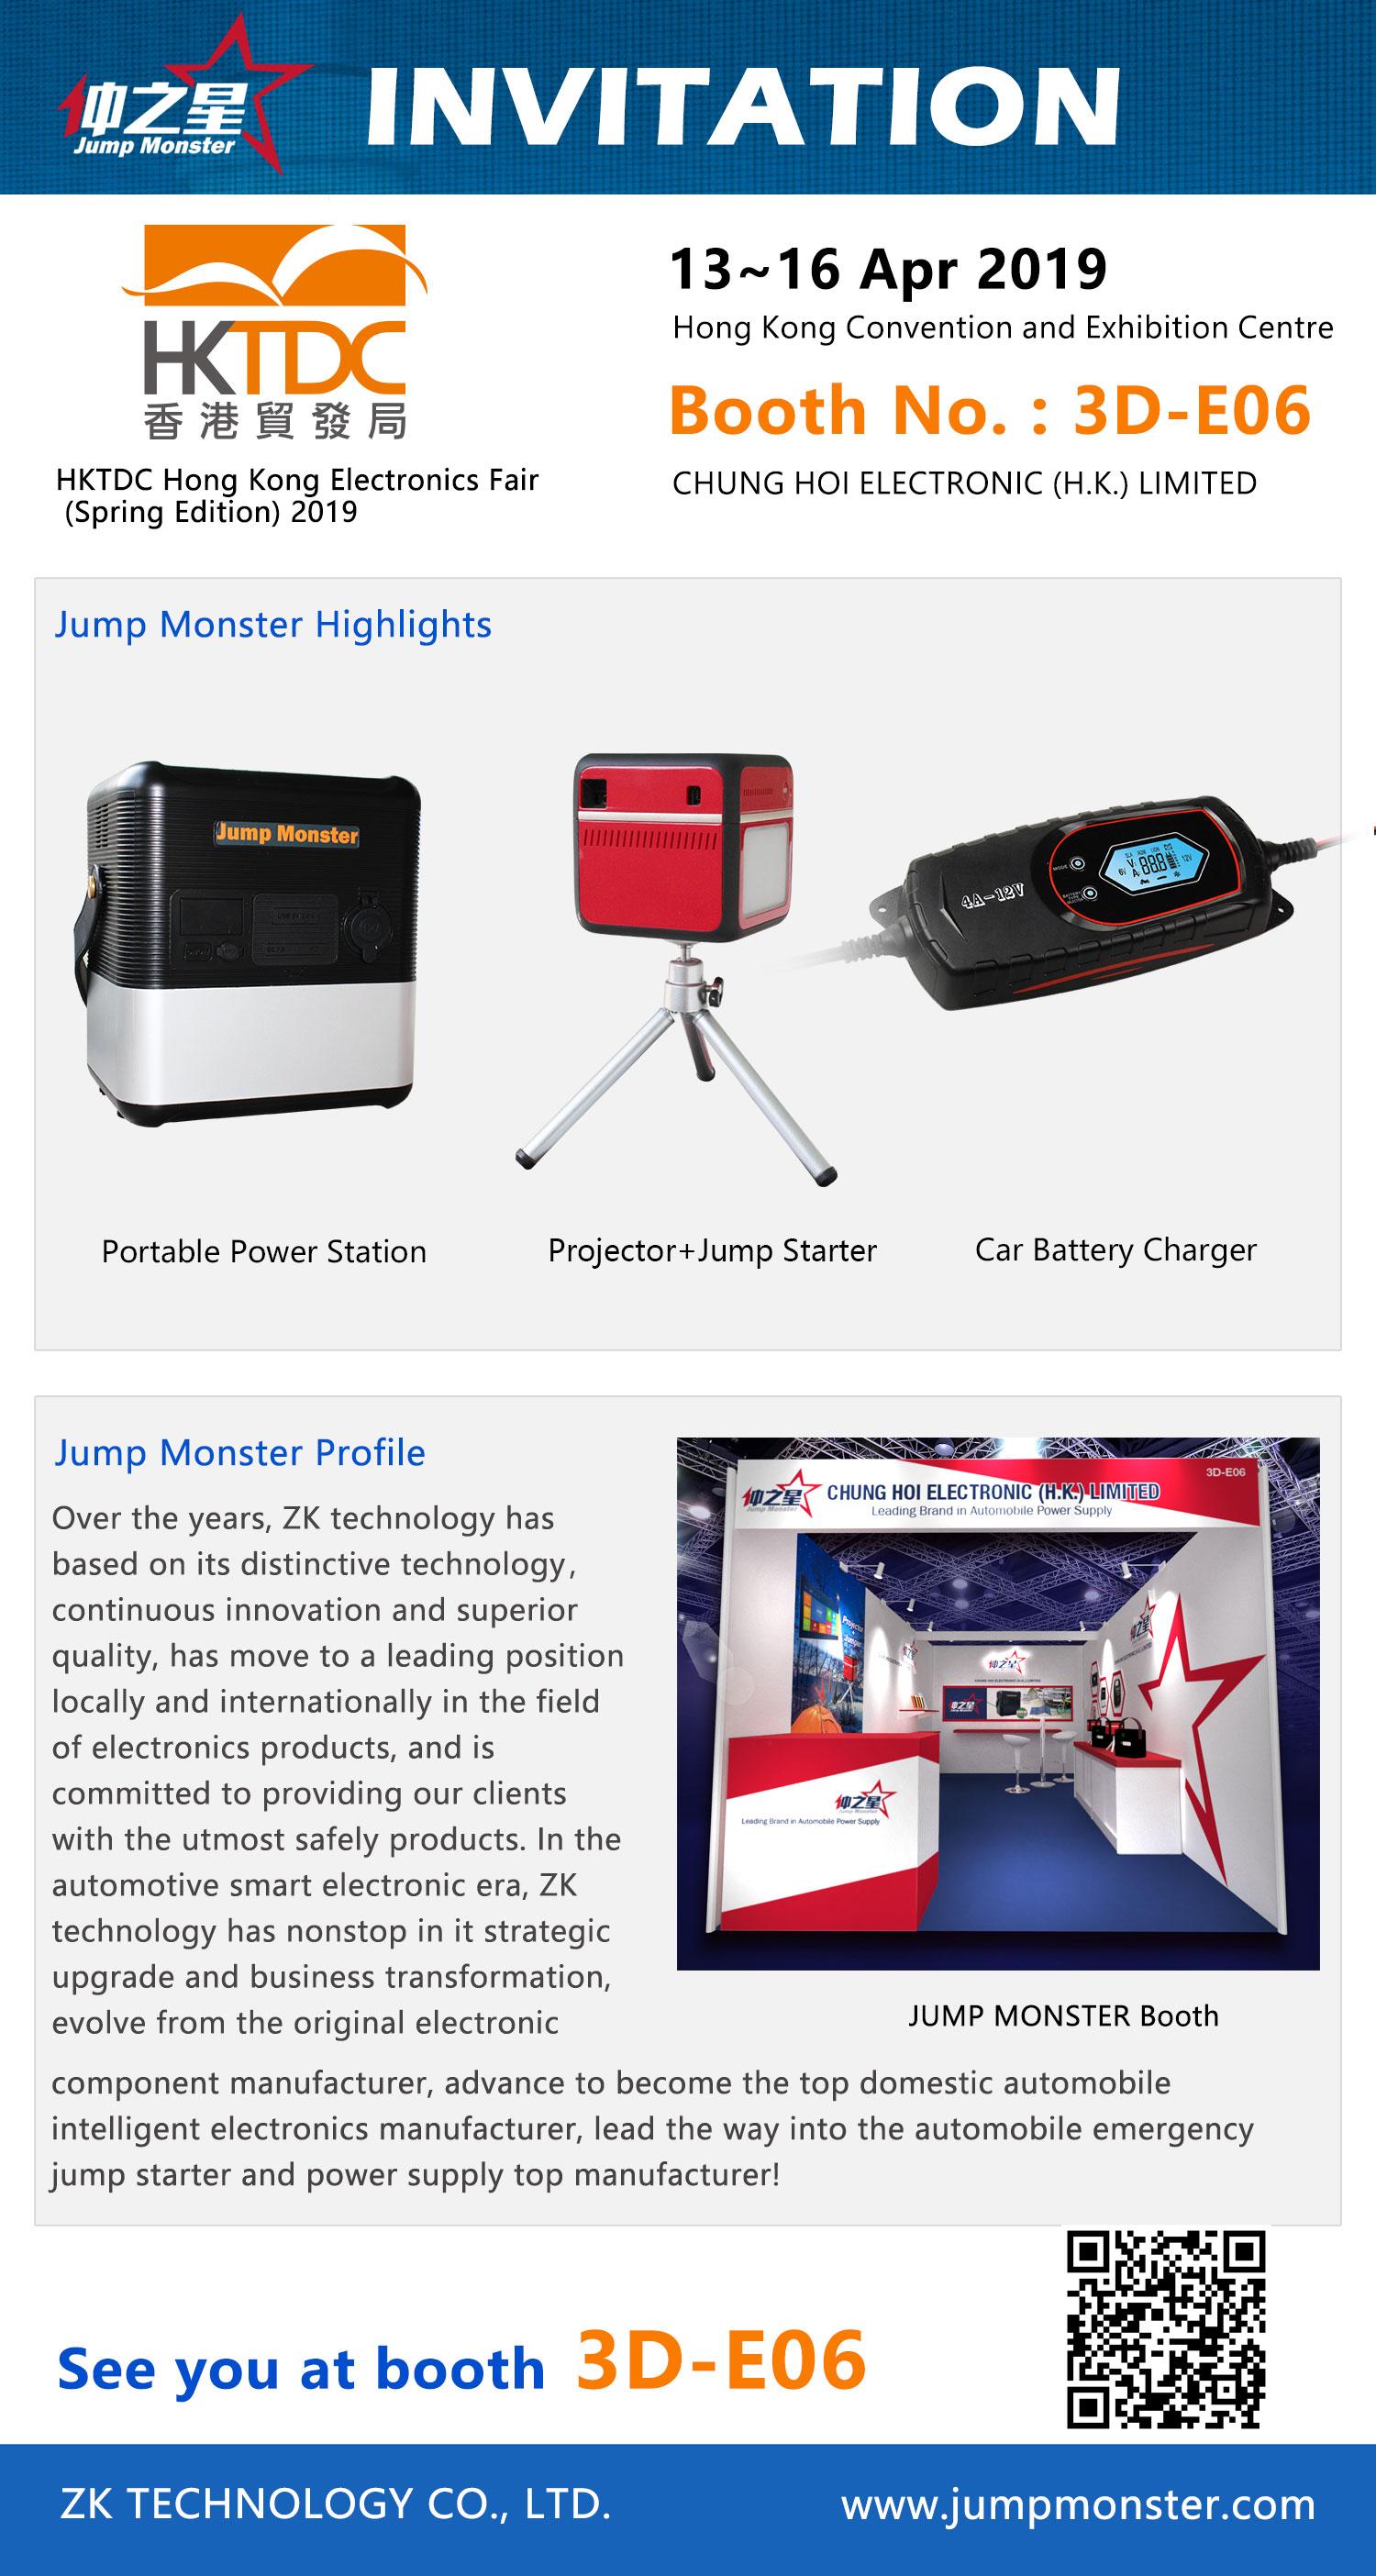 HKTDC Hong Kong Electronics Fair(Spring Edition)2019